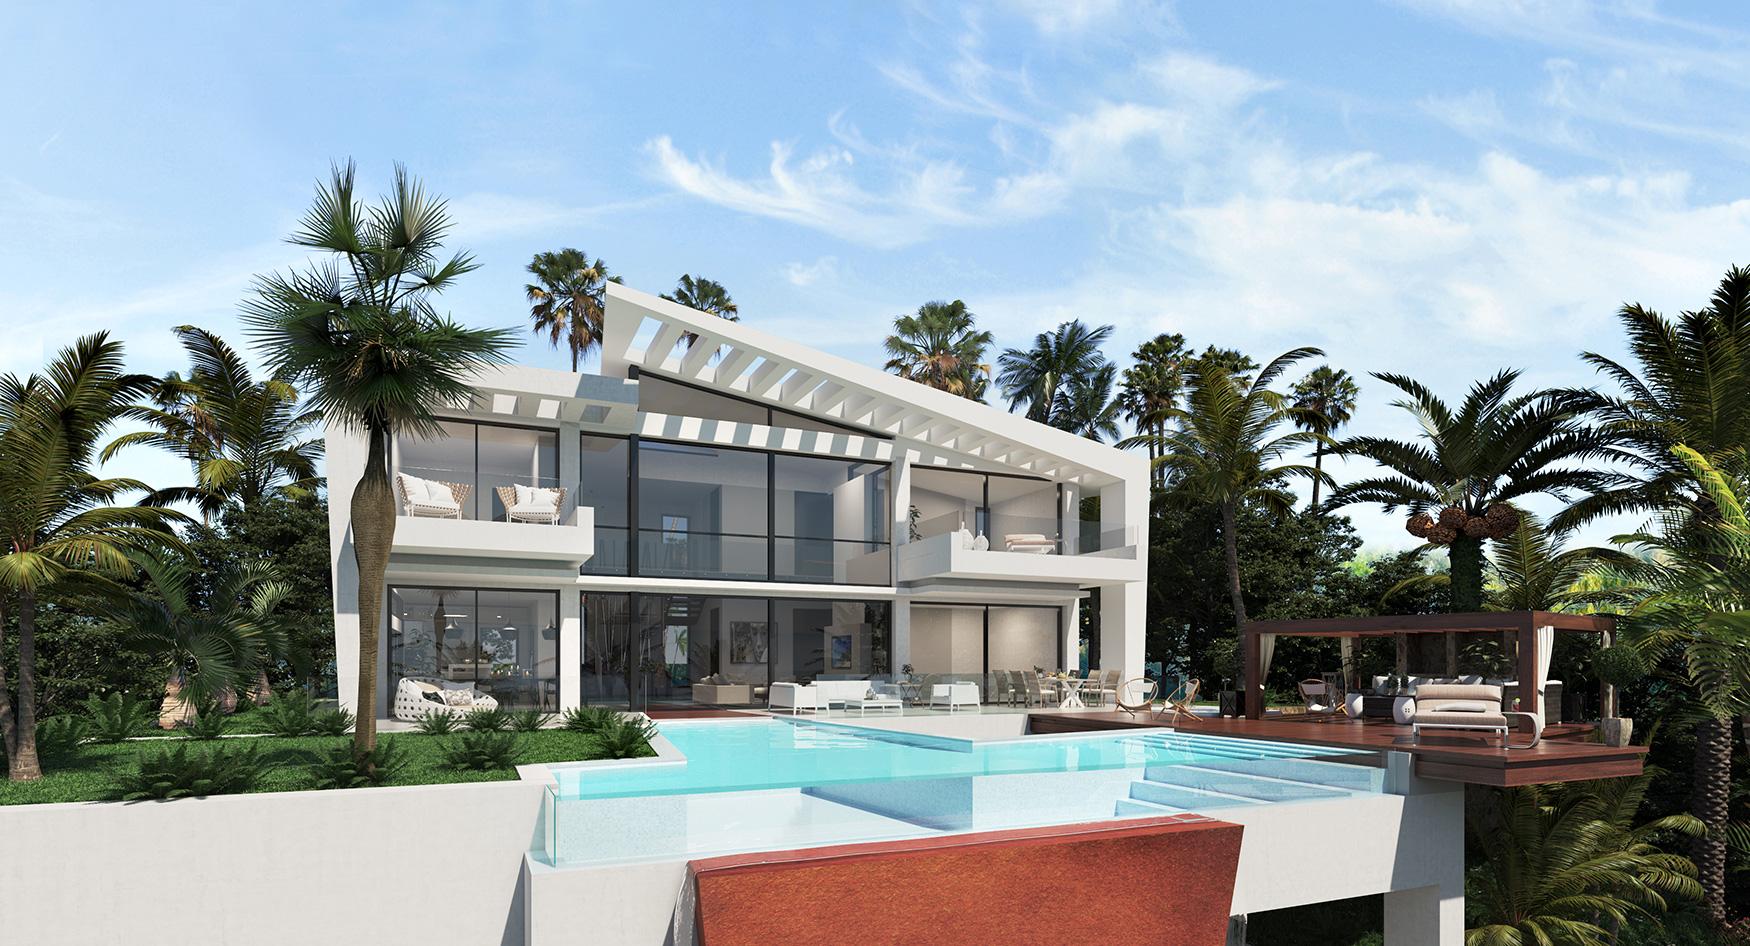 Vista de la piscina y el jardin-Infinitum Passive House- Costa del Sol